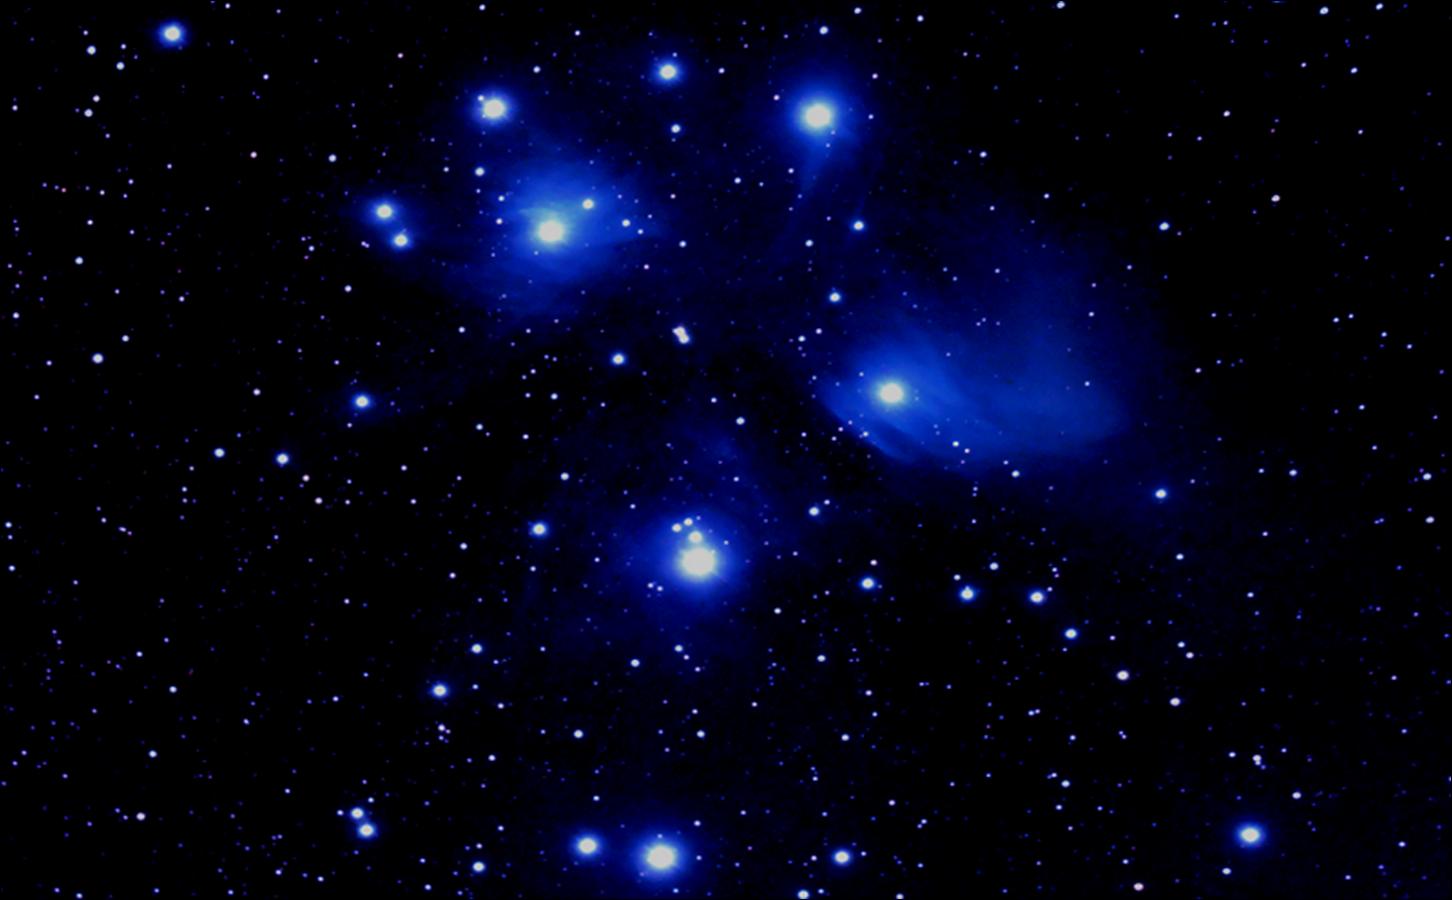 ramalan bintang ramalan bintang yang bersifat prediksi seringkali